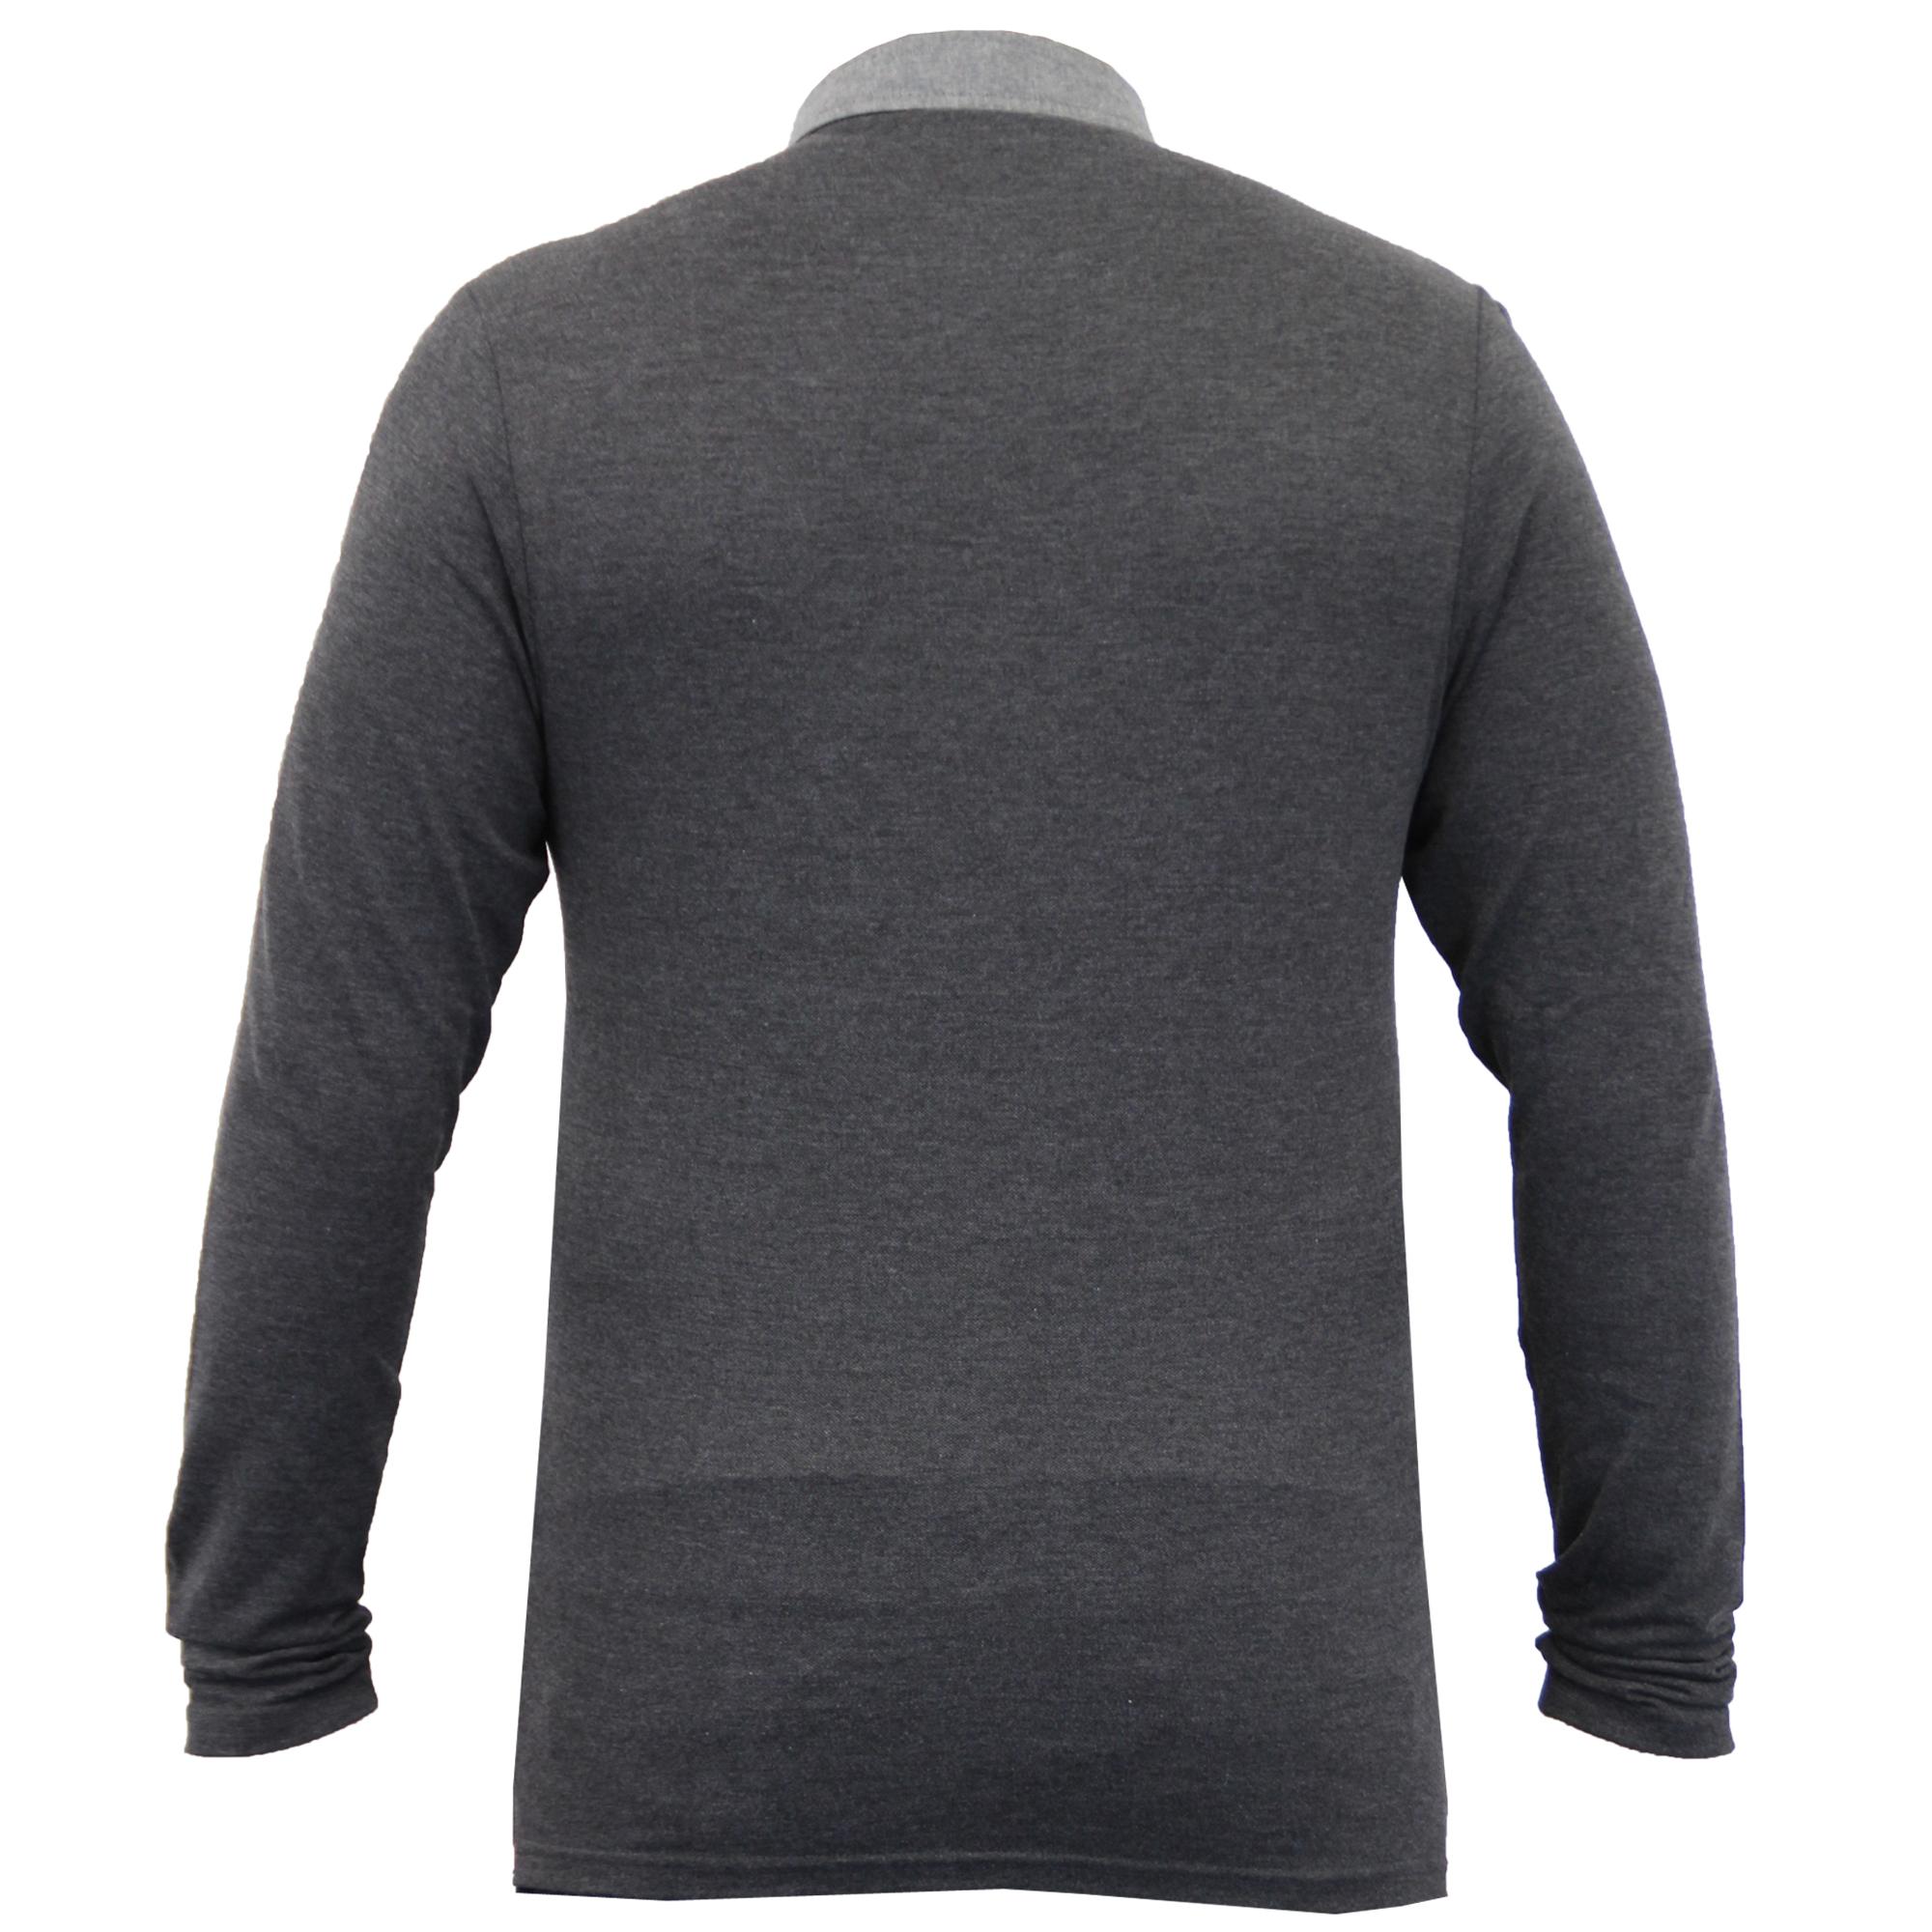 Homme-a-Manches-Longues-Jersey-Top-Brave-Soul-Pique-Polo-T-Shirt-A-Col-Ete-Neuf miniature 13